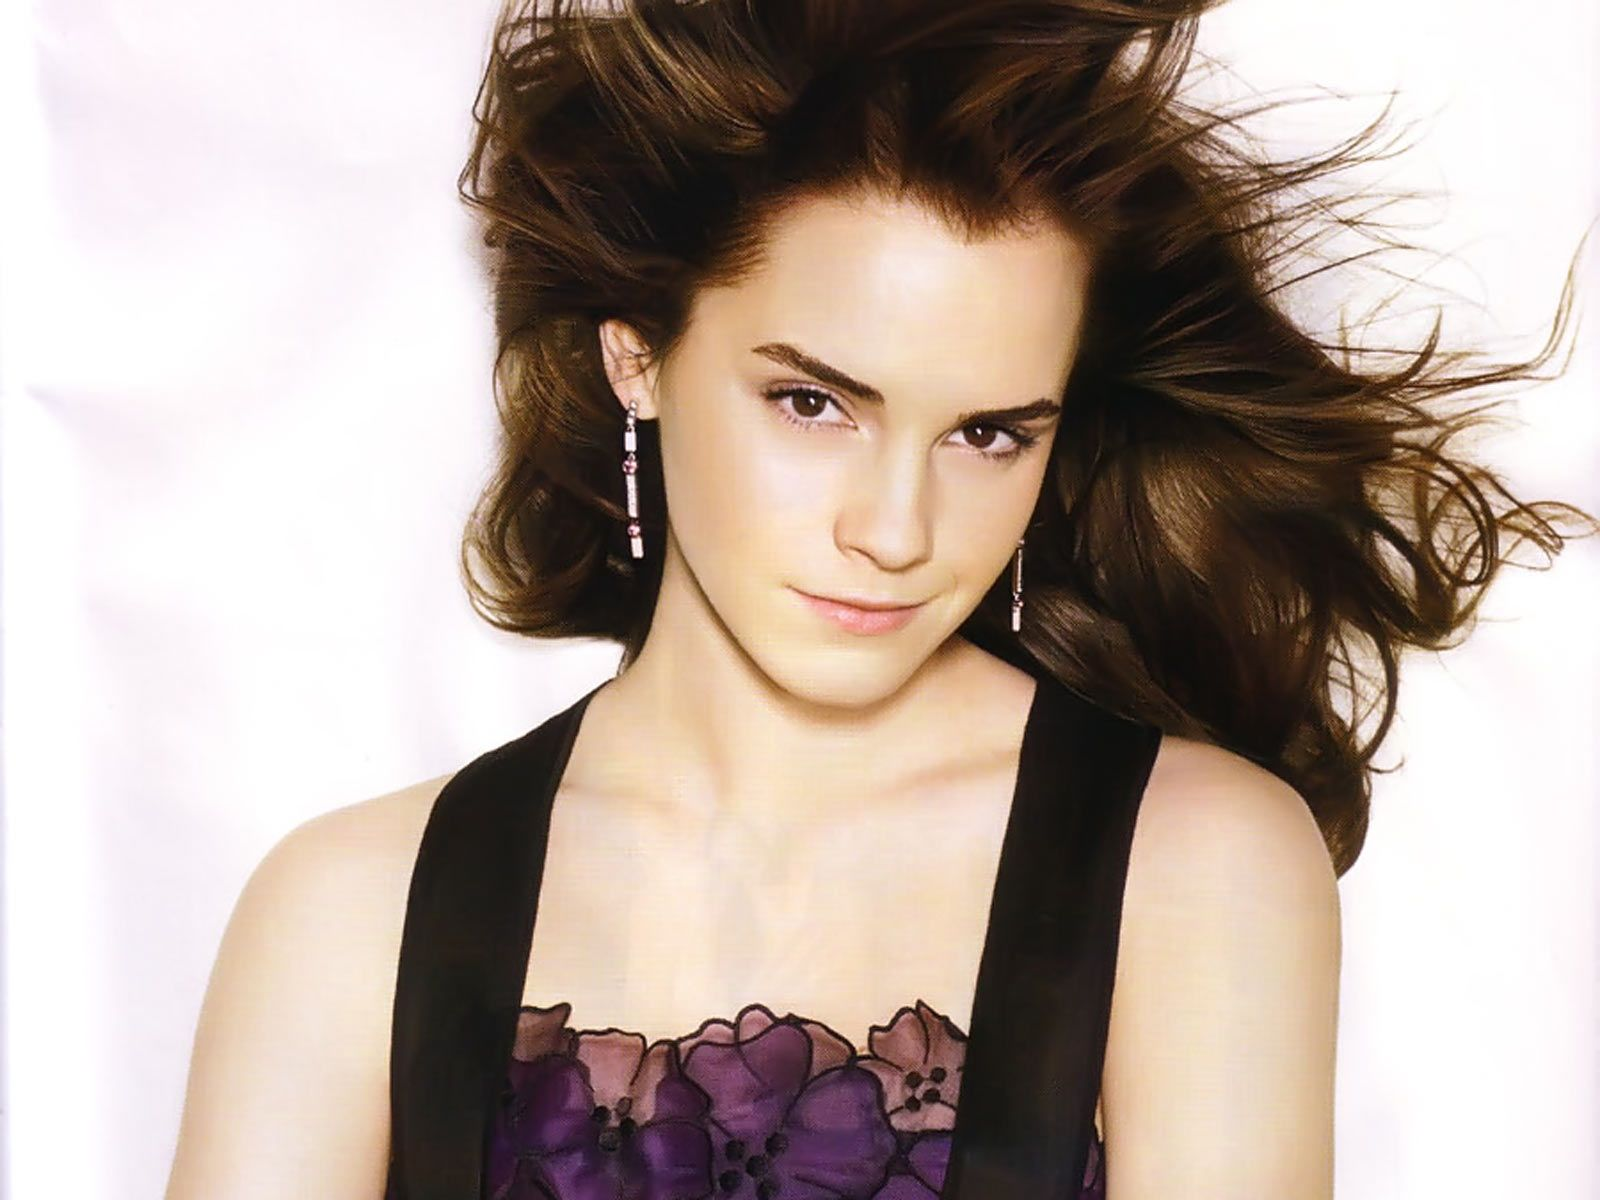 Emma Watson Wallpaper 2